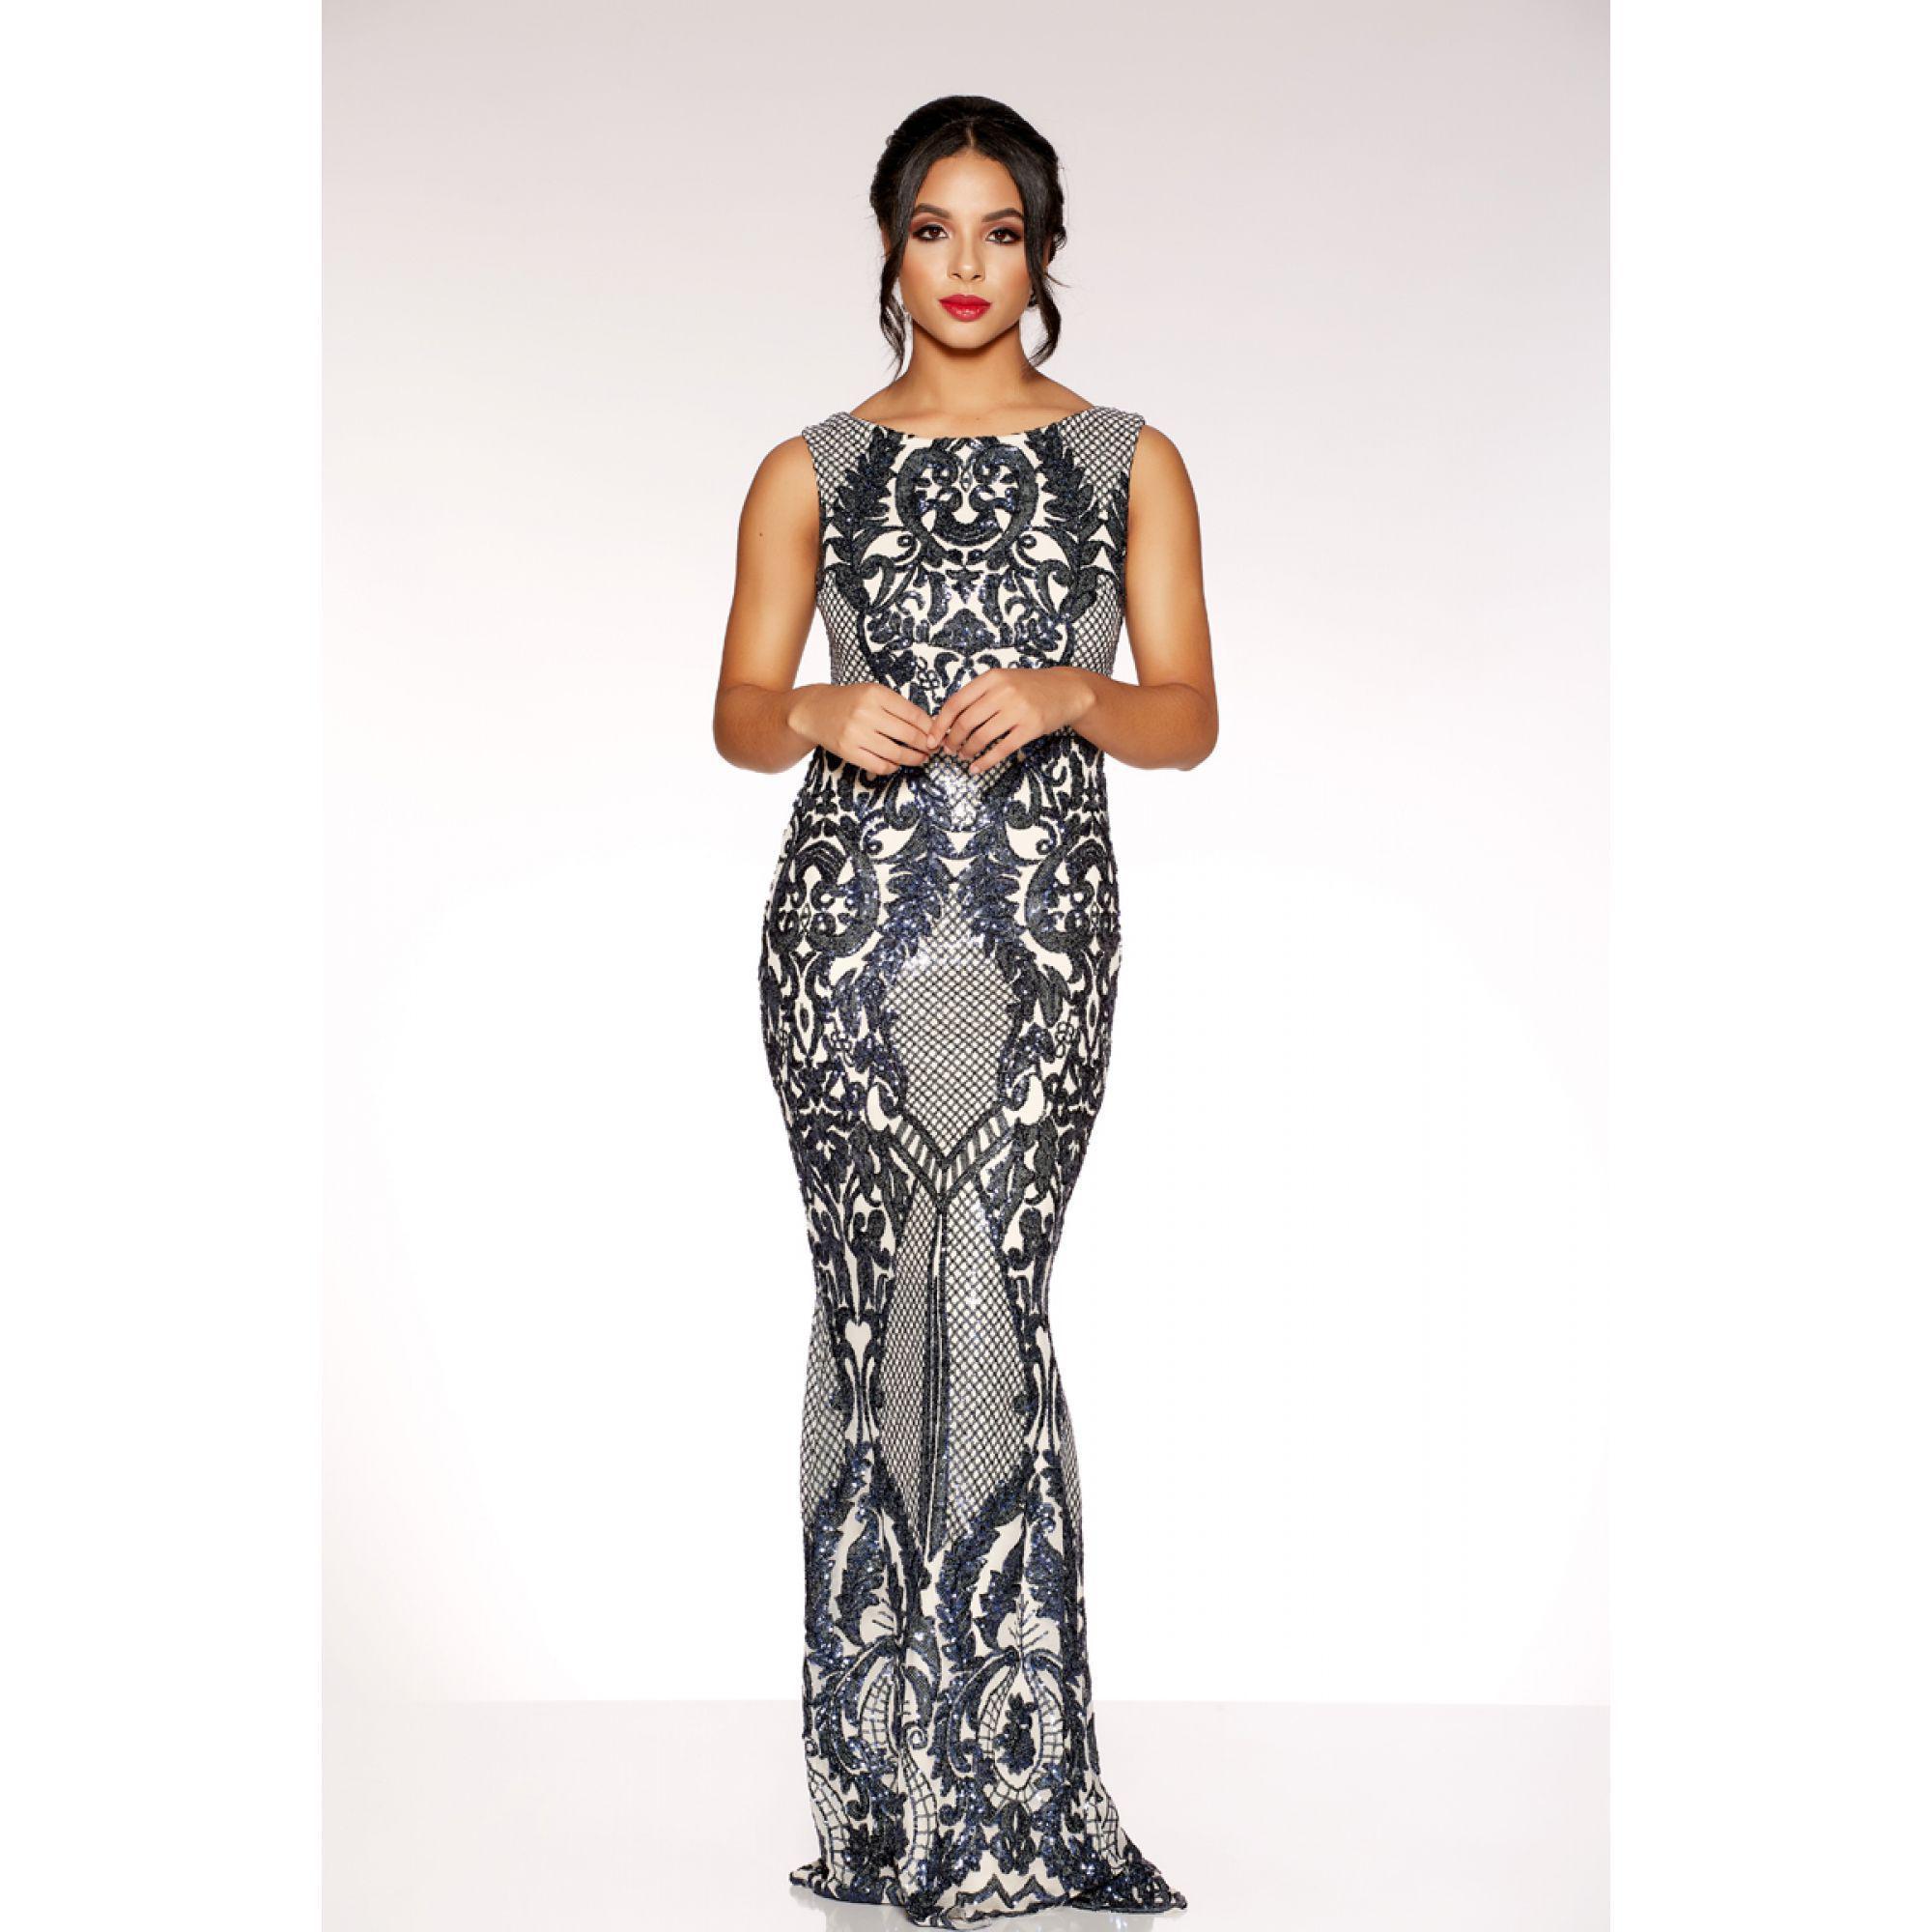 bdd721c5 Black And Gold Sequin High Neck Fishtail Maxi Dress | Saddha